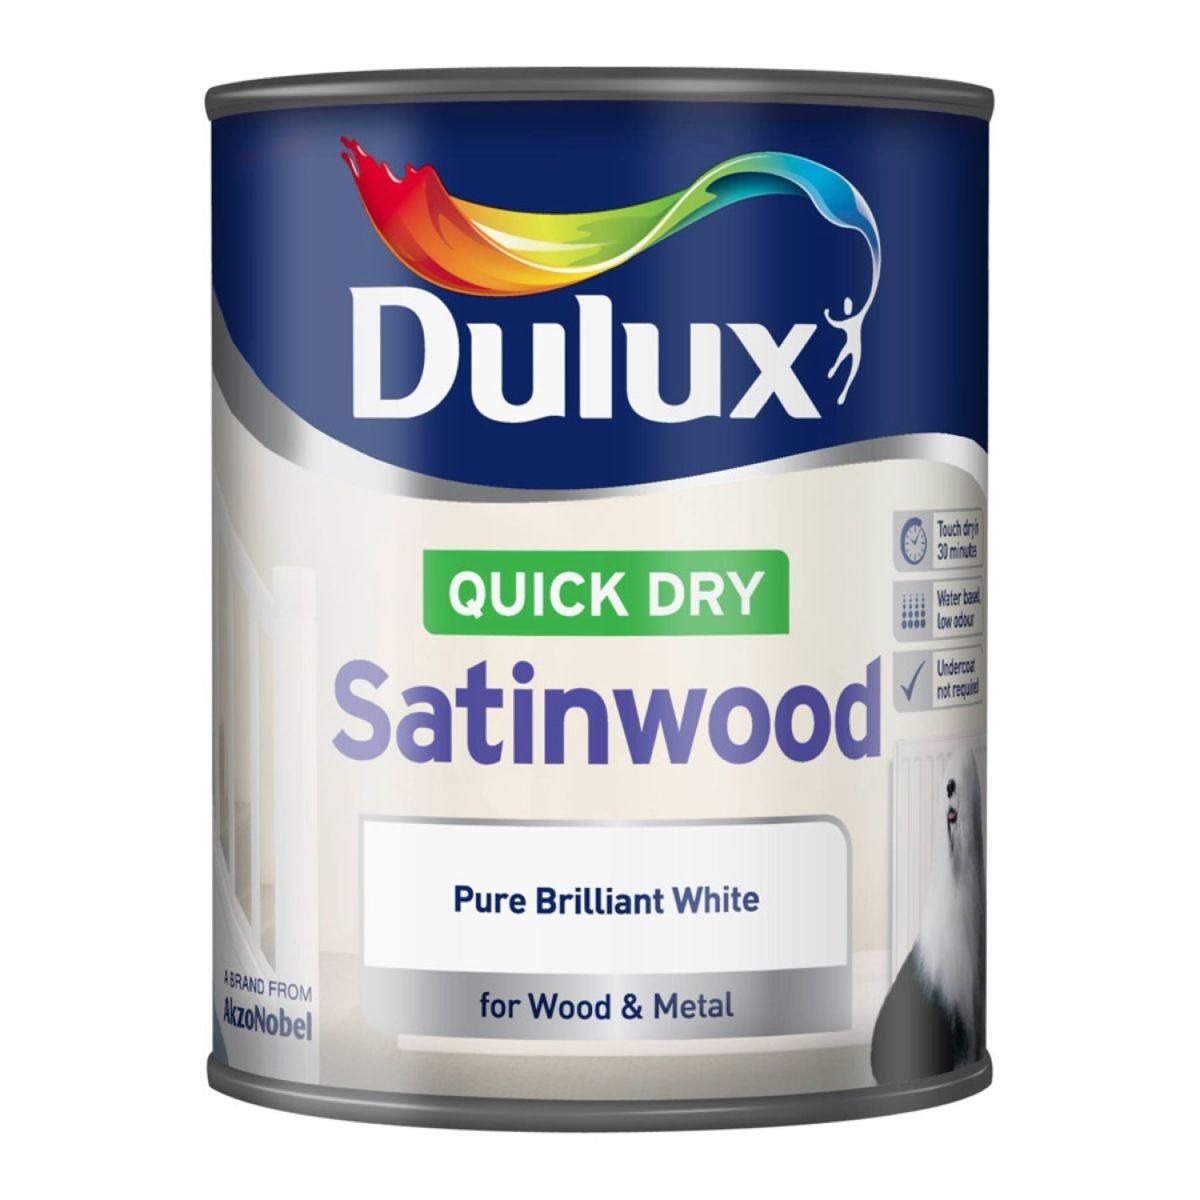 Dulux Quick Dry Satinwood Paint - Brilliant White, 750ml